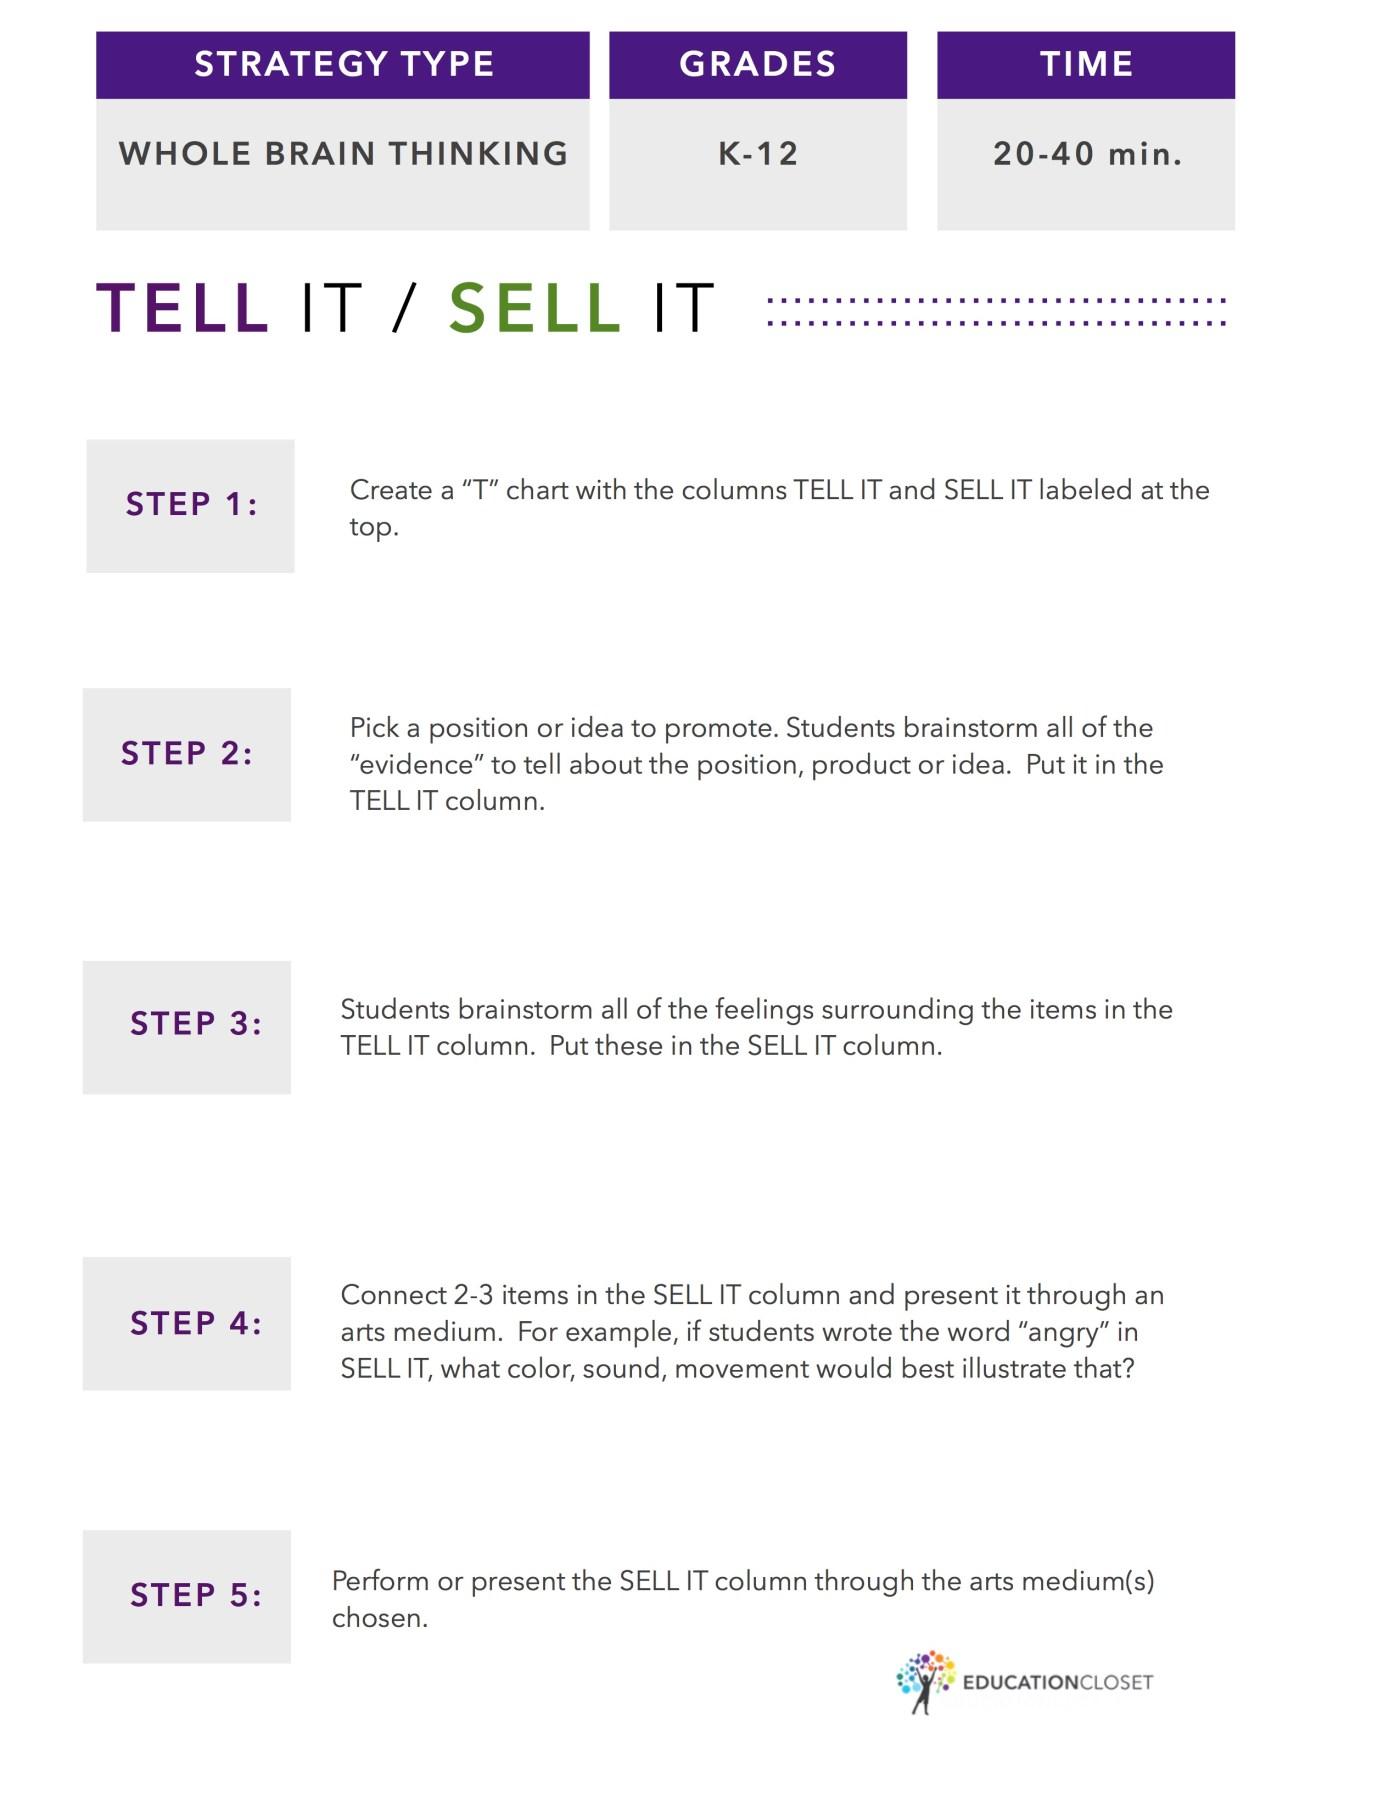 Whole Brain Thinking Strategy: Tell It/Sell It